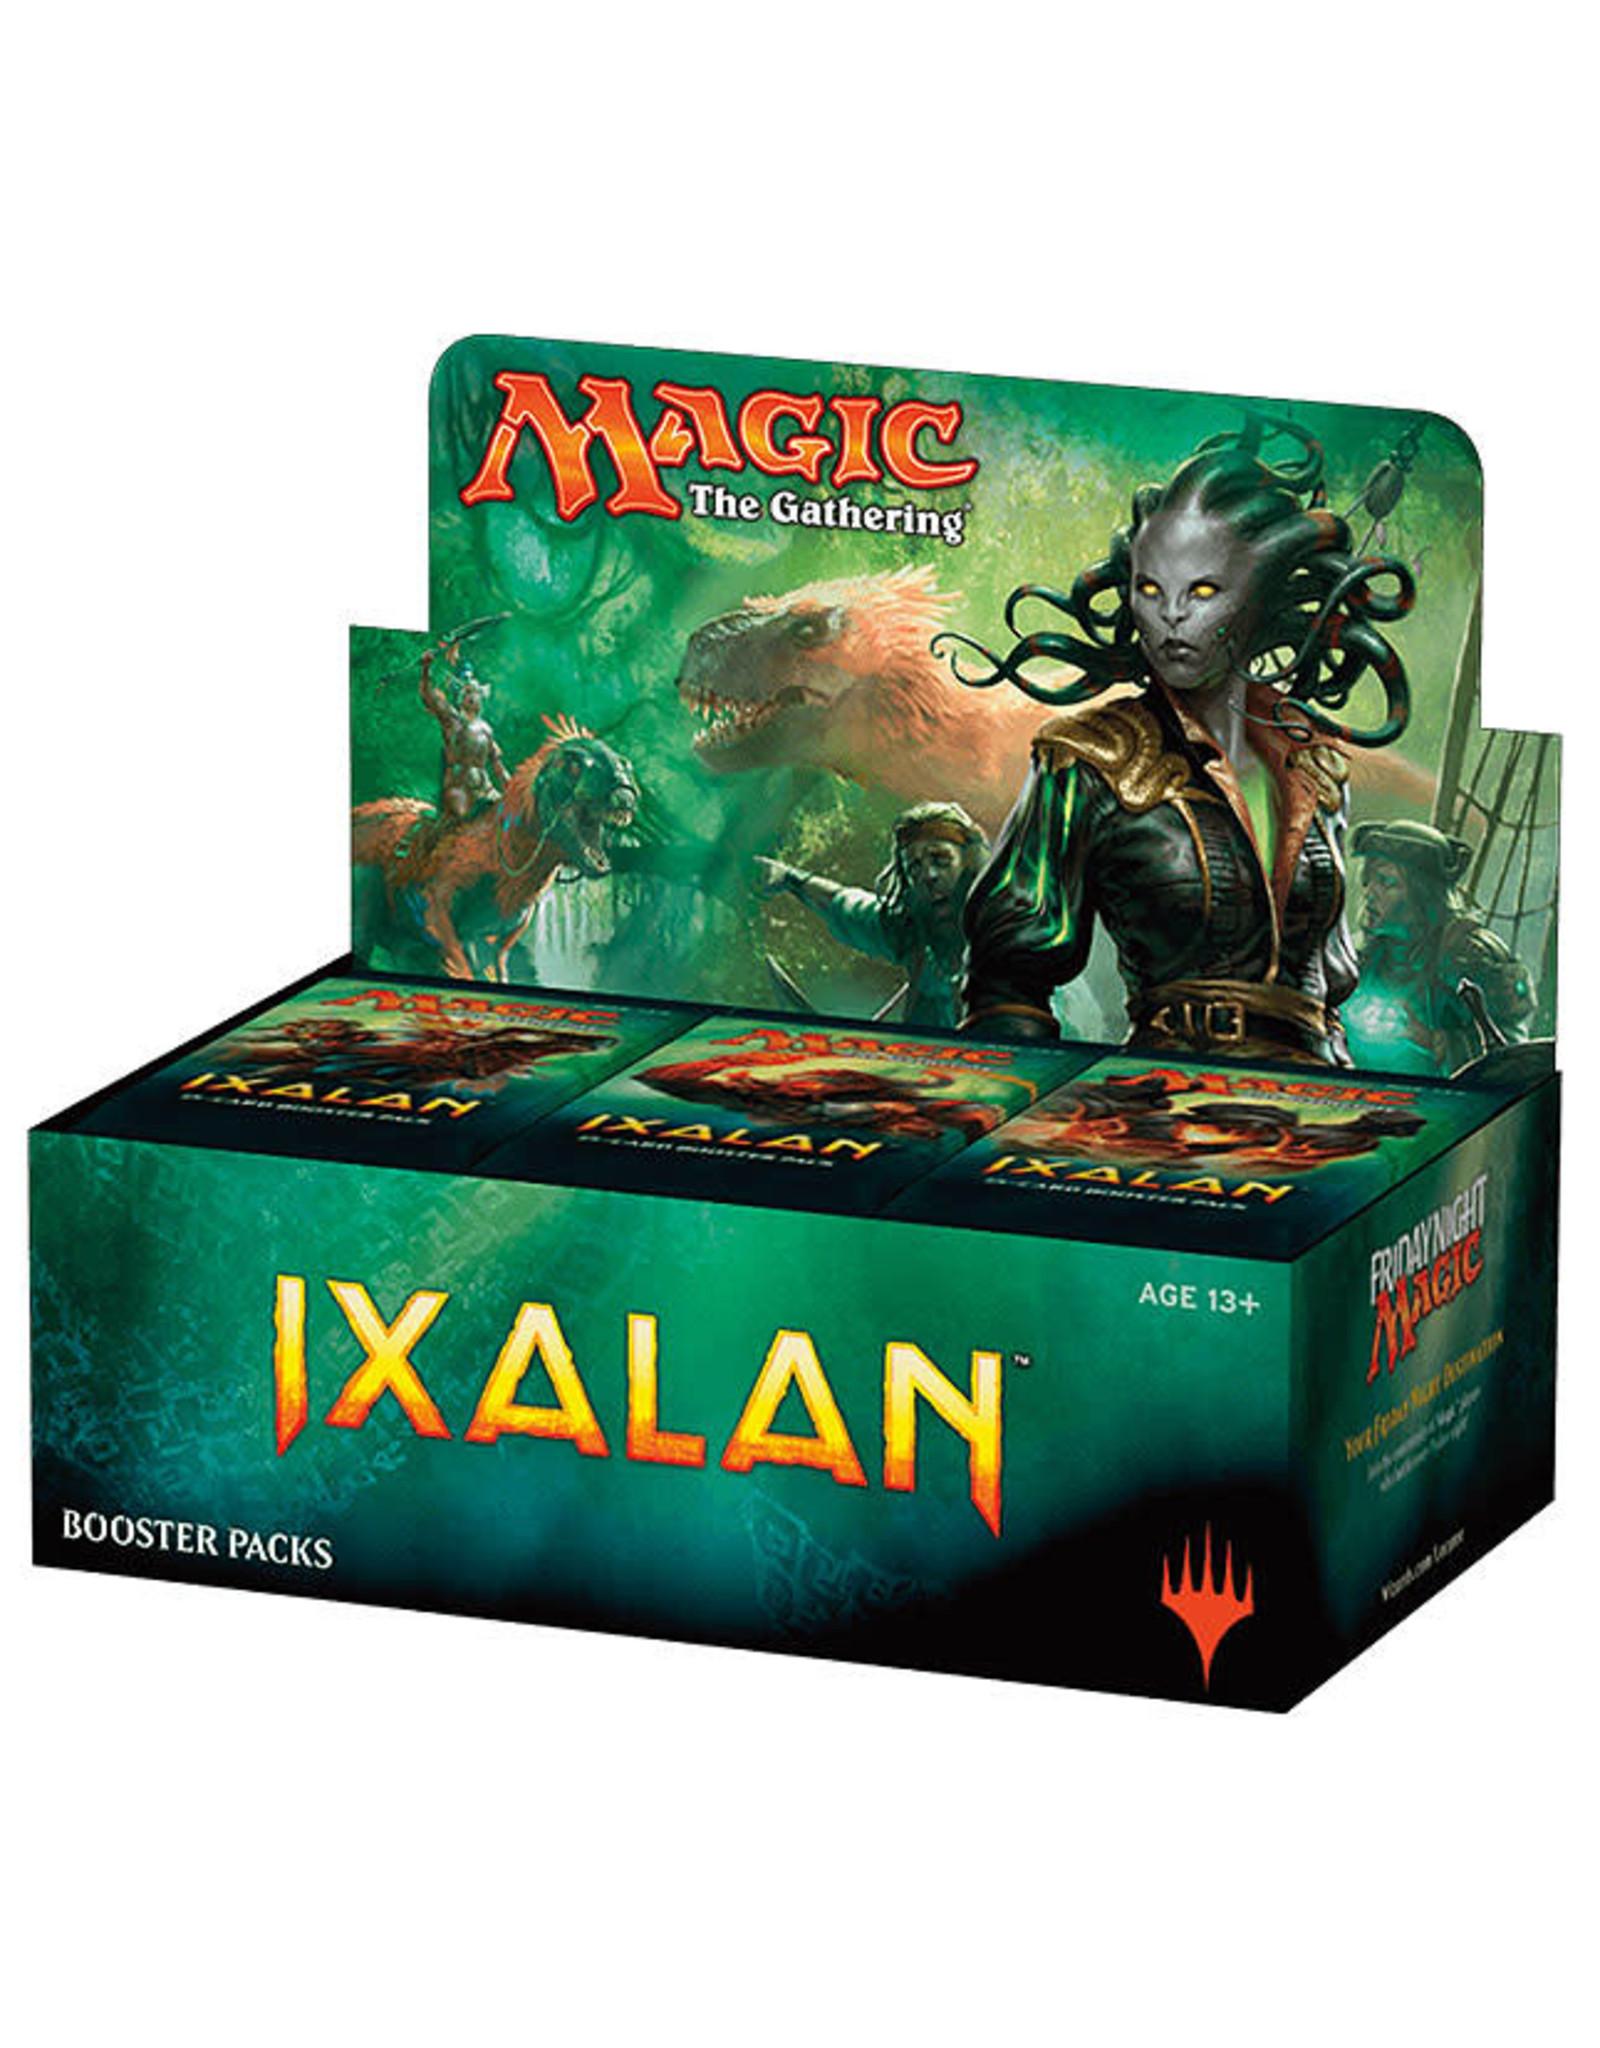 Wizards of the Coast MTG: Ixalan Booster Box